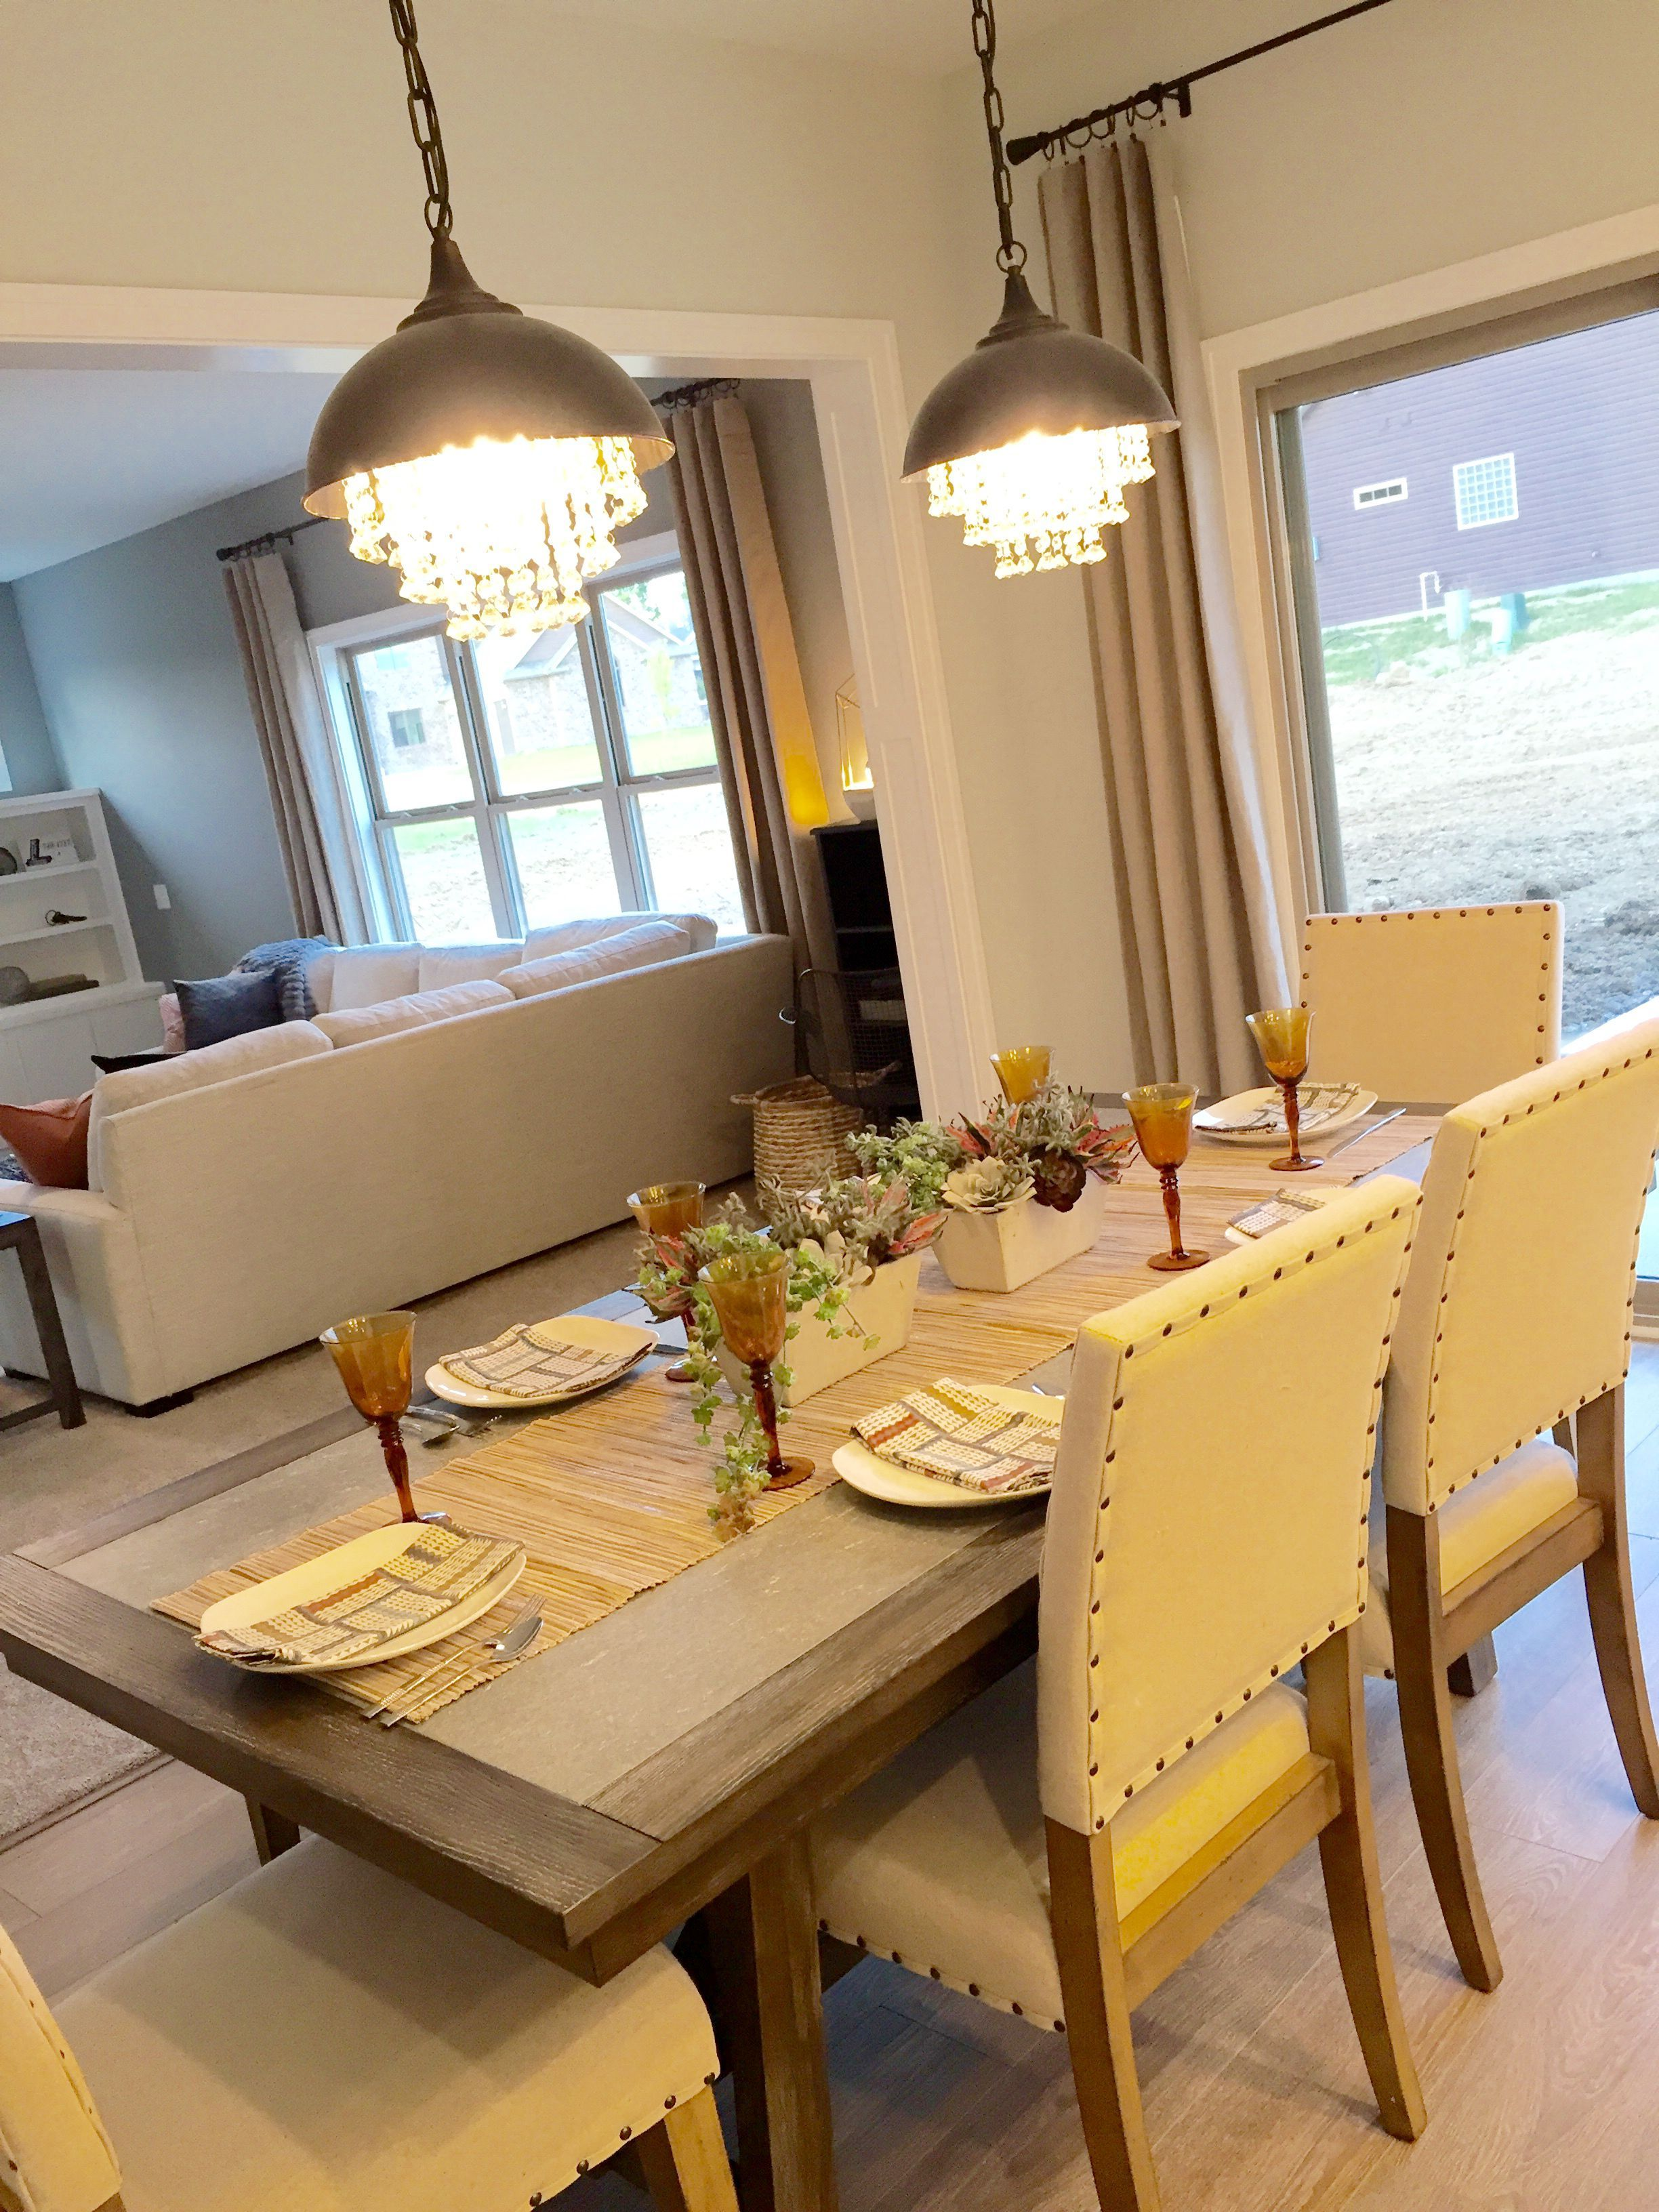 Loving the ceiling bling! | Home decor, Home, Dining table on Dining Table Ceiling Design  id=85669